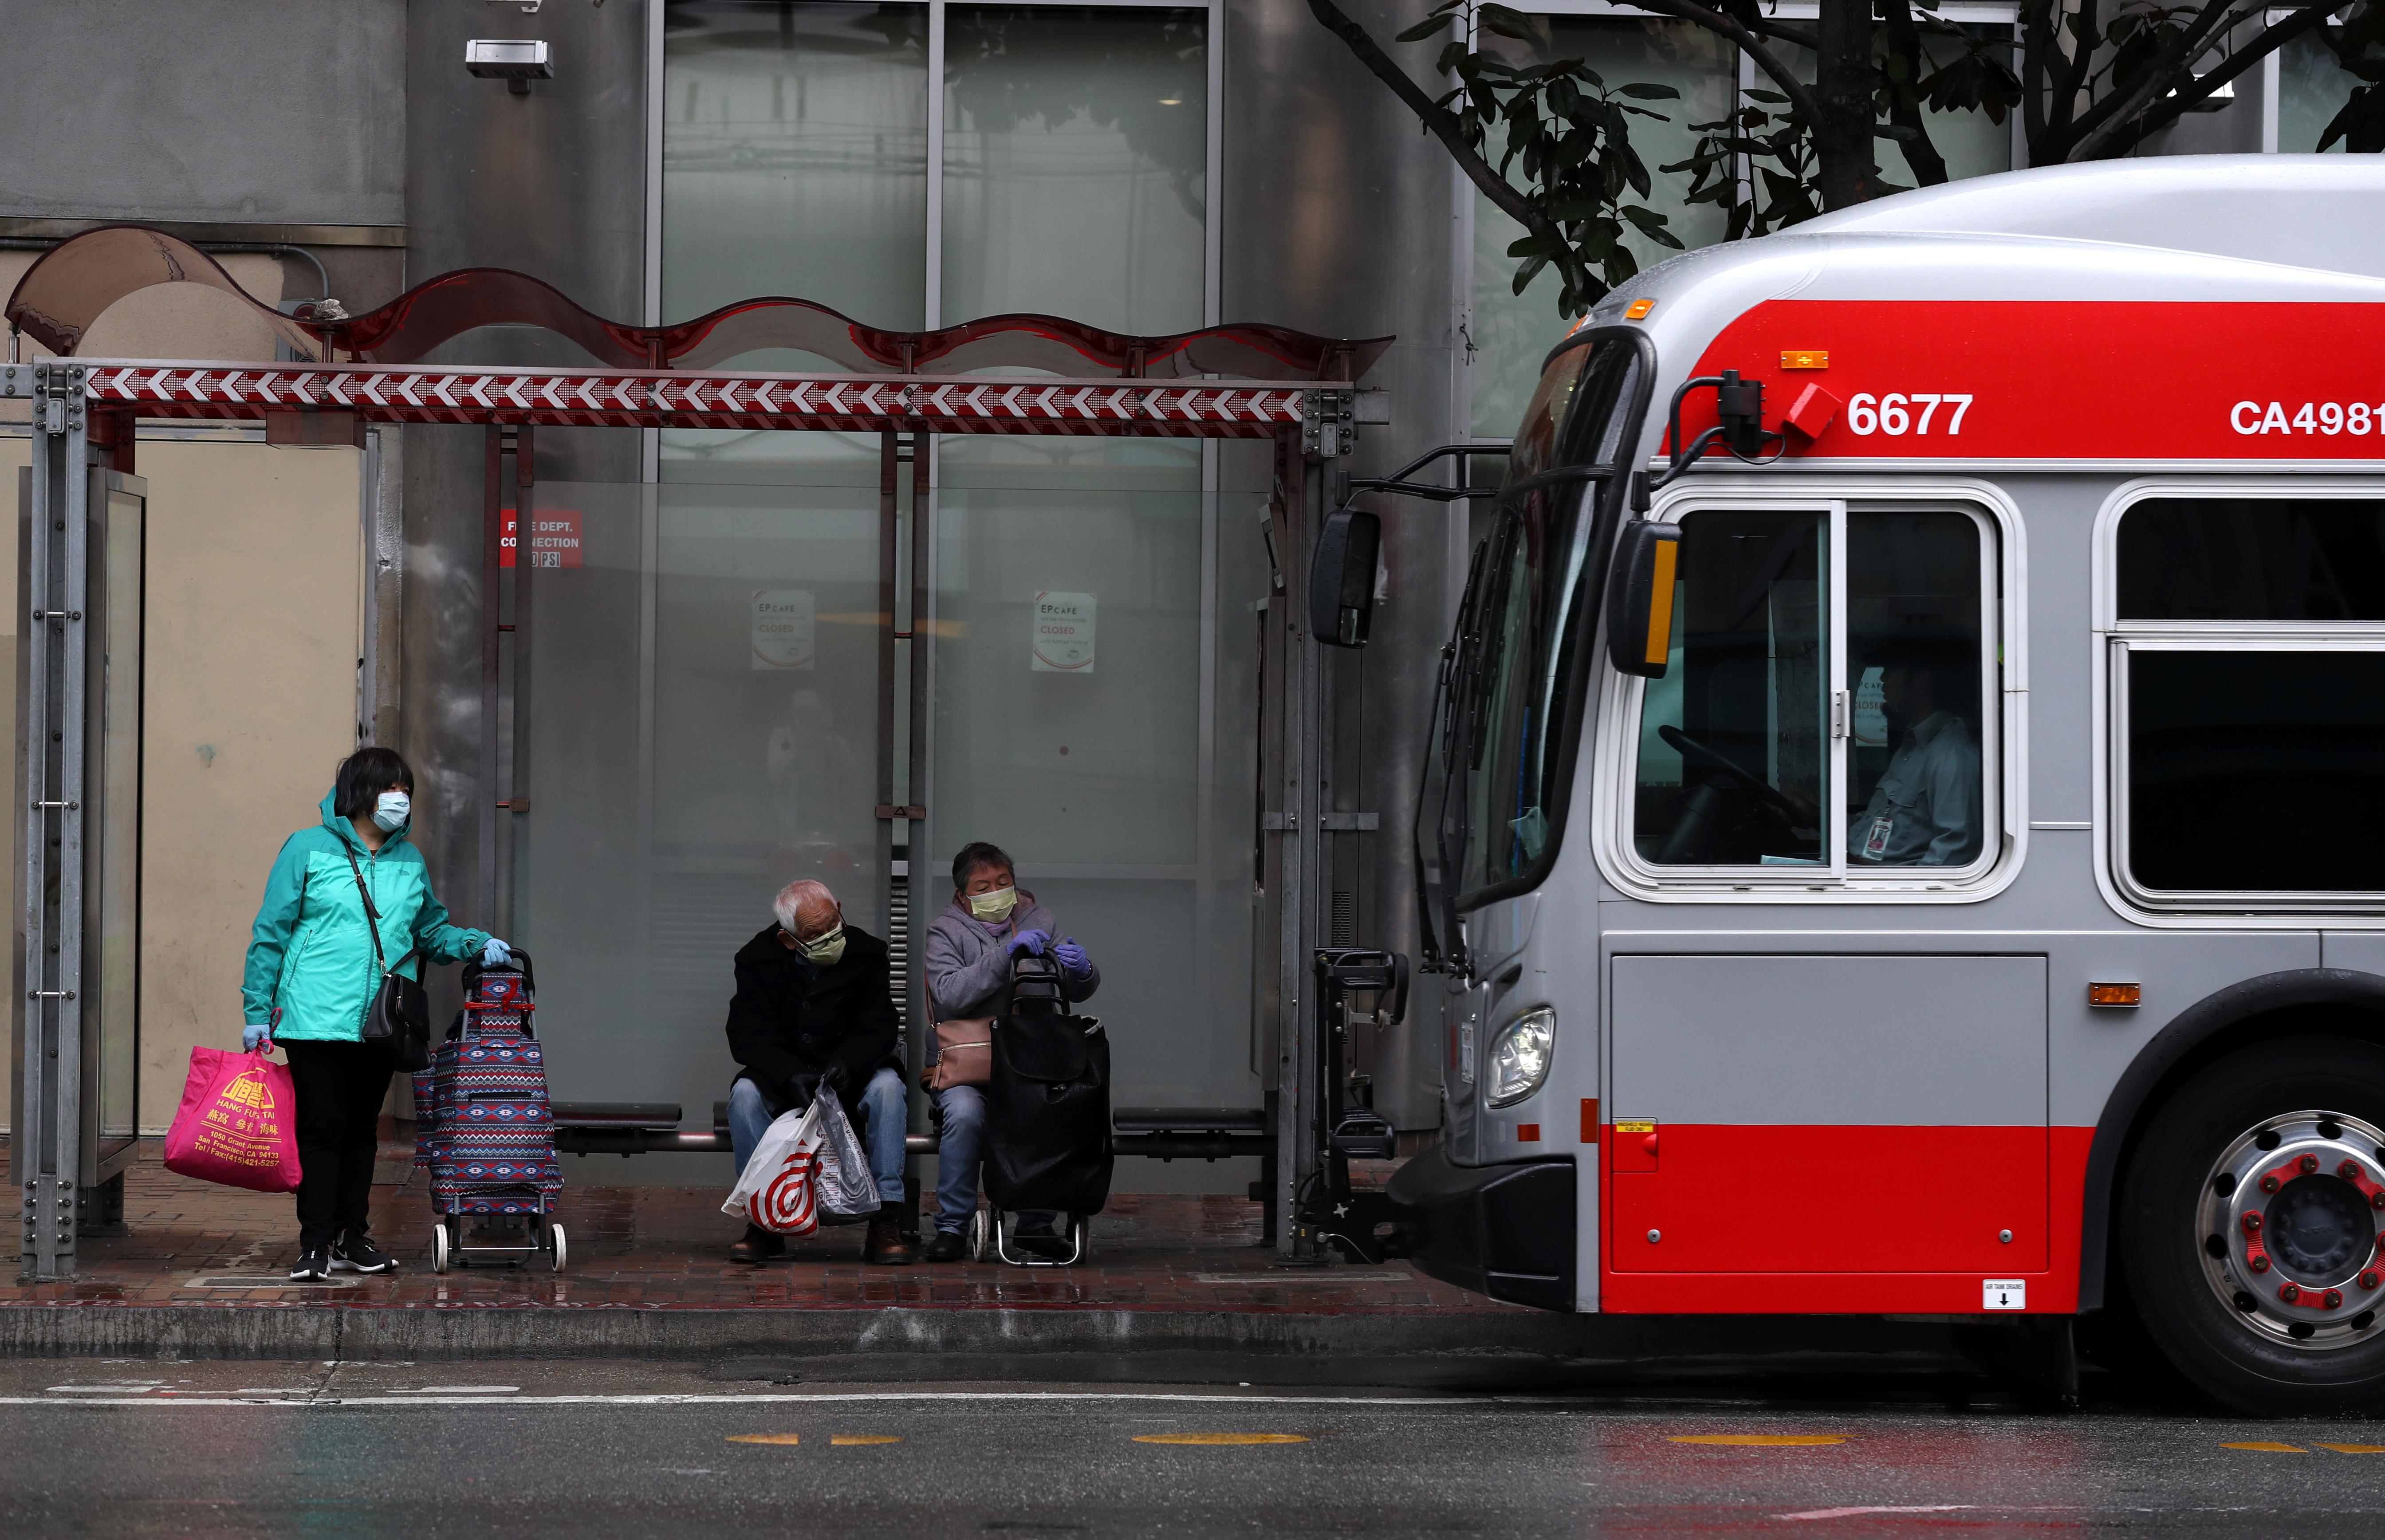 San Francisco's Muni To Cut Majority Of Service During Coronavirus Shutdown